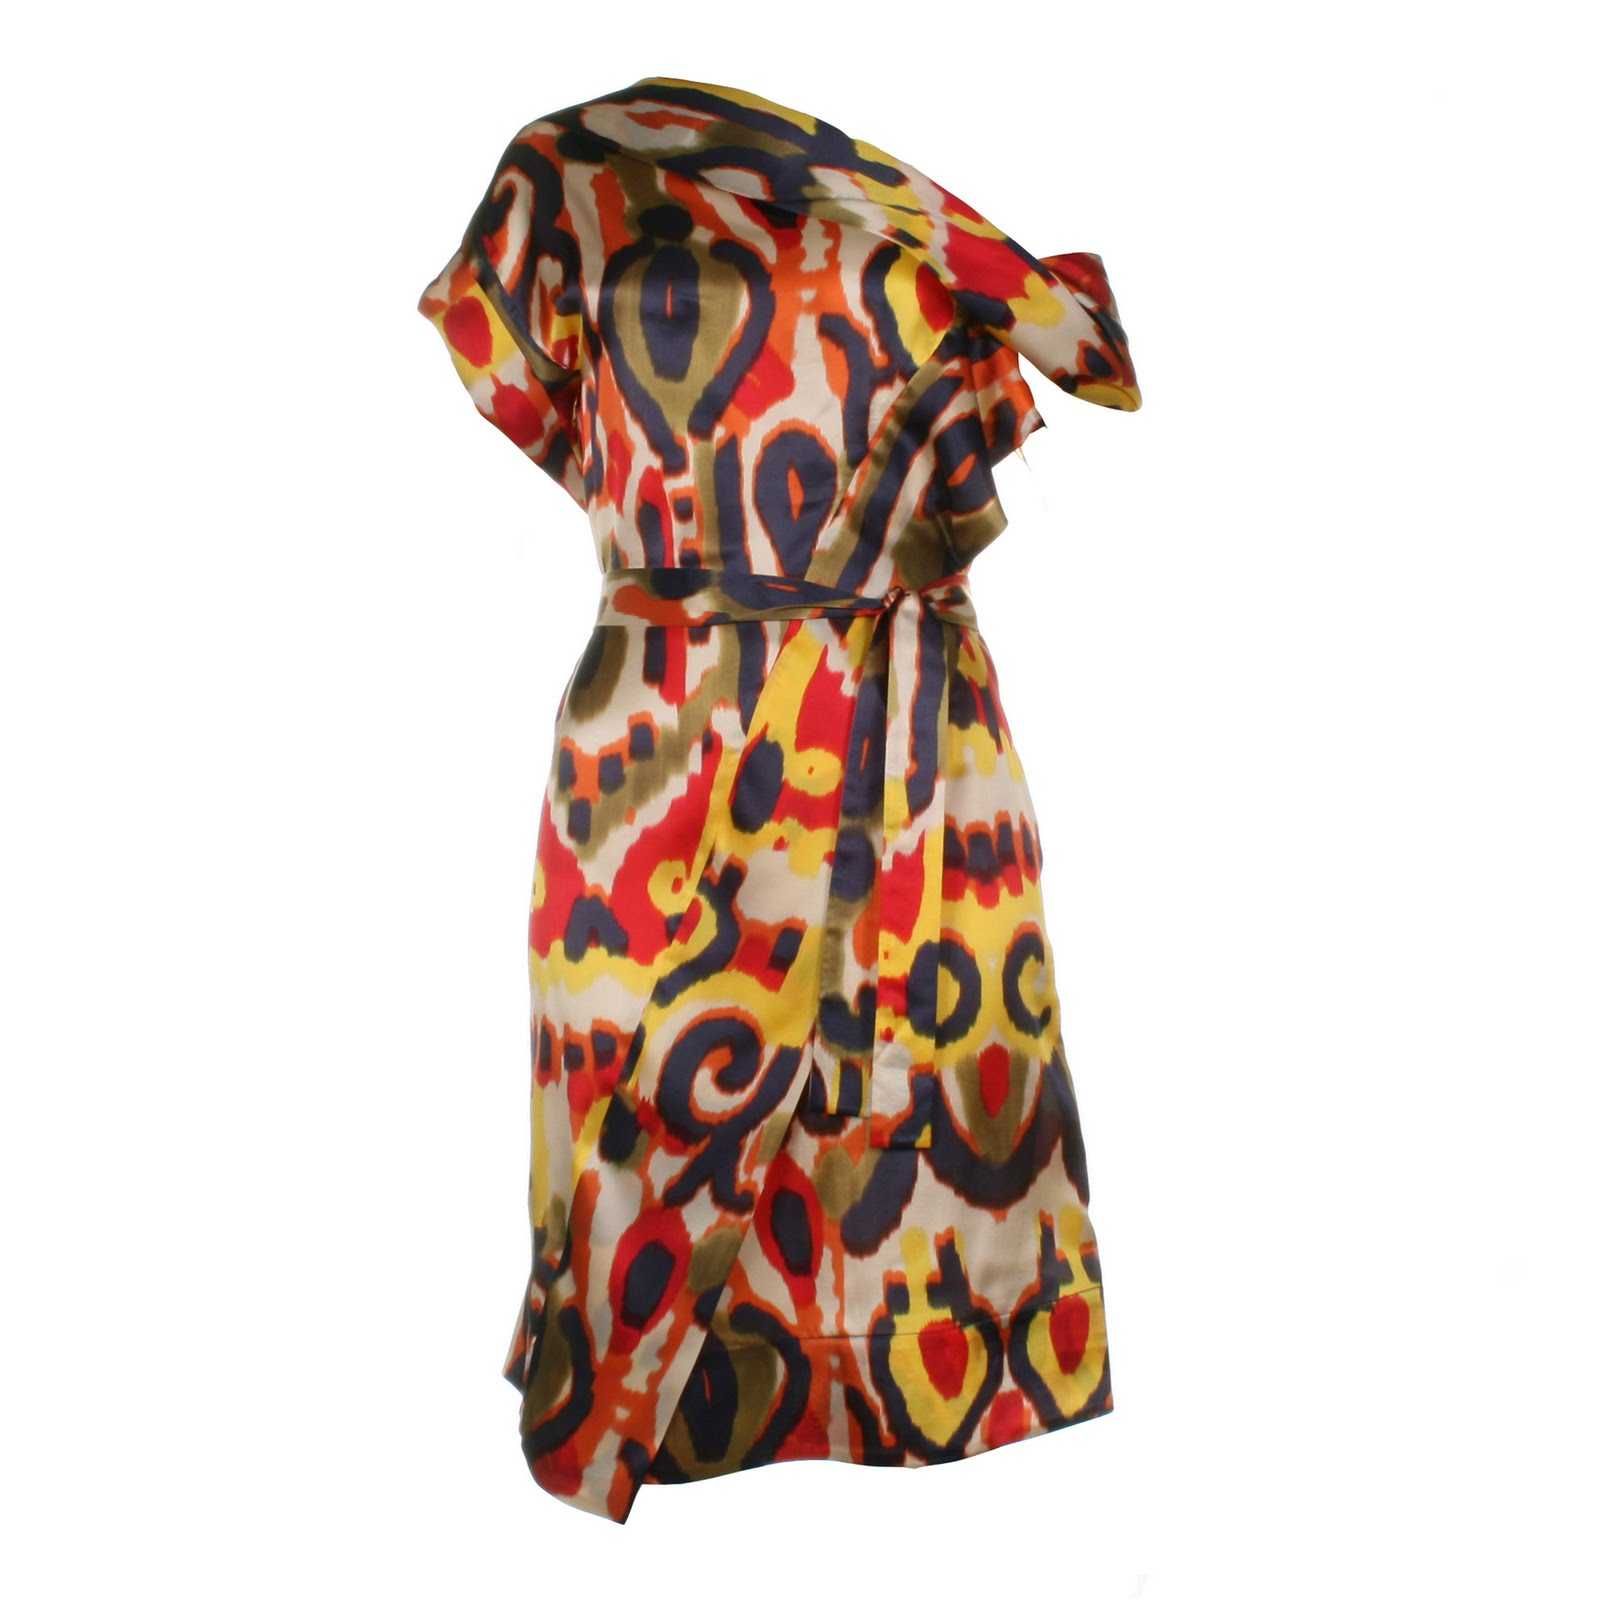 http://3.bp.blogspot.com/-5WBX9ak5Dys/TgJE1HBD4tI/AAAAAAAAFSw/uH6GxJiGL1w/s1600/Vivienne+Westwood+Womens+African+Hand+Painted+Multicoloured+Dress+510+www+vanmildert+com.jpg